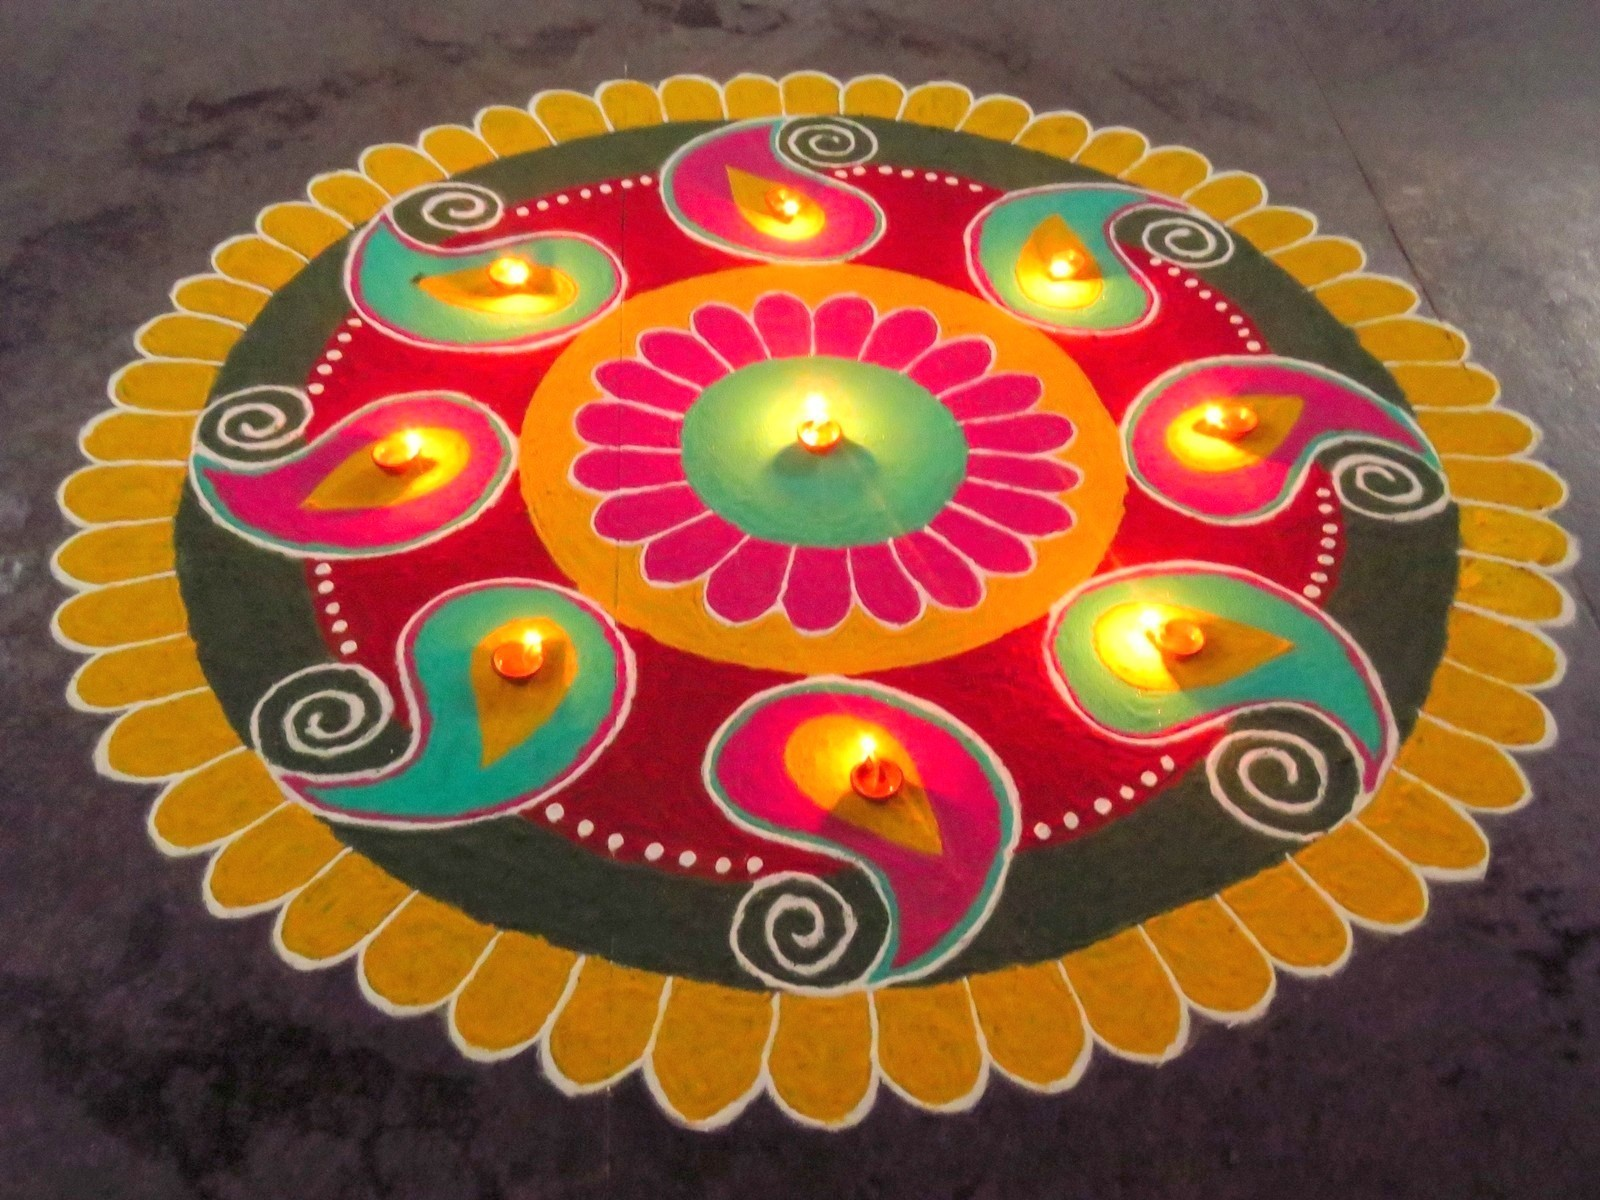 Diwali Rangoli 2020: 12 Simple New Rangoli Design for everyone  Diwali Rangoli Images Designs Diwali Rangoli